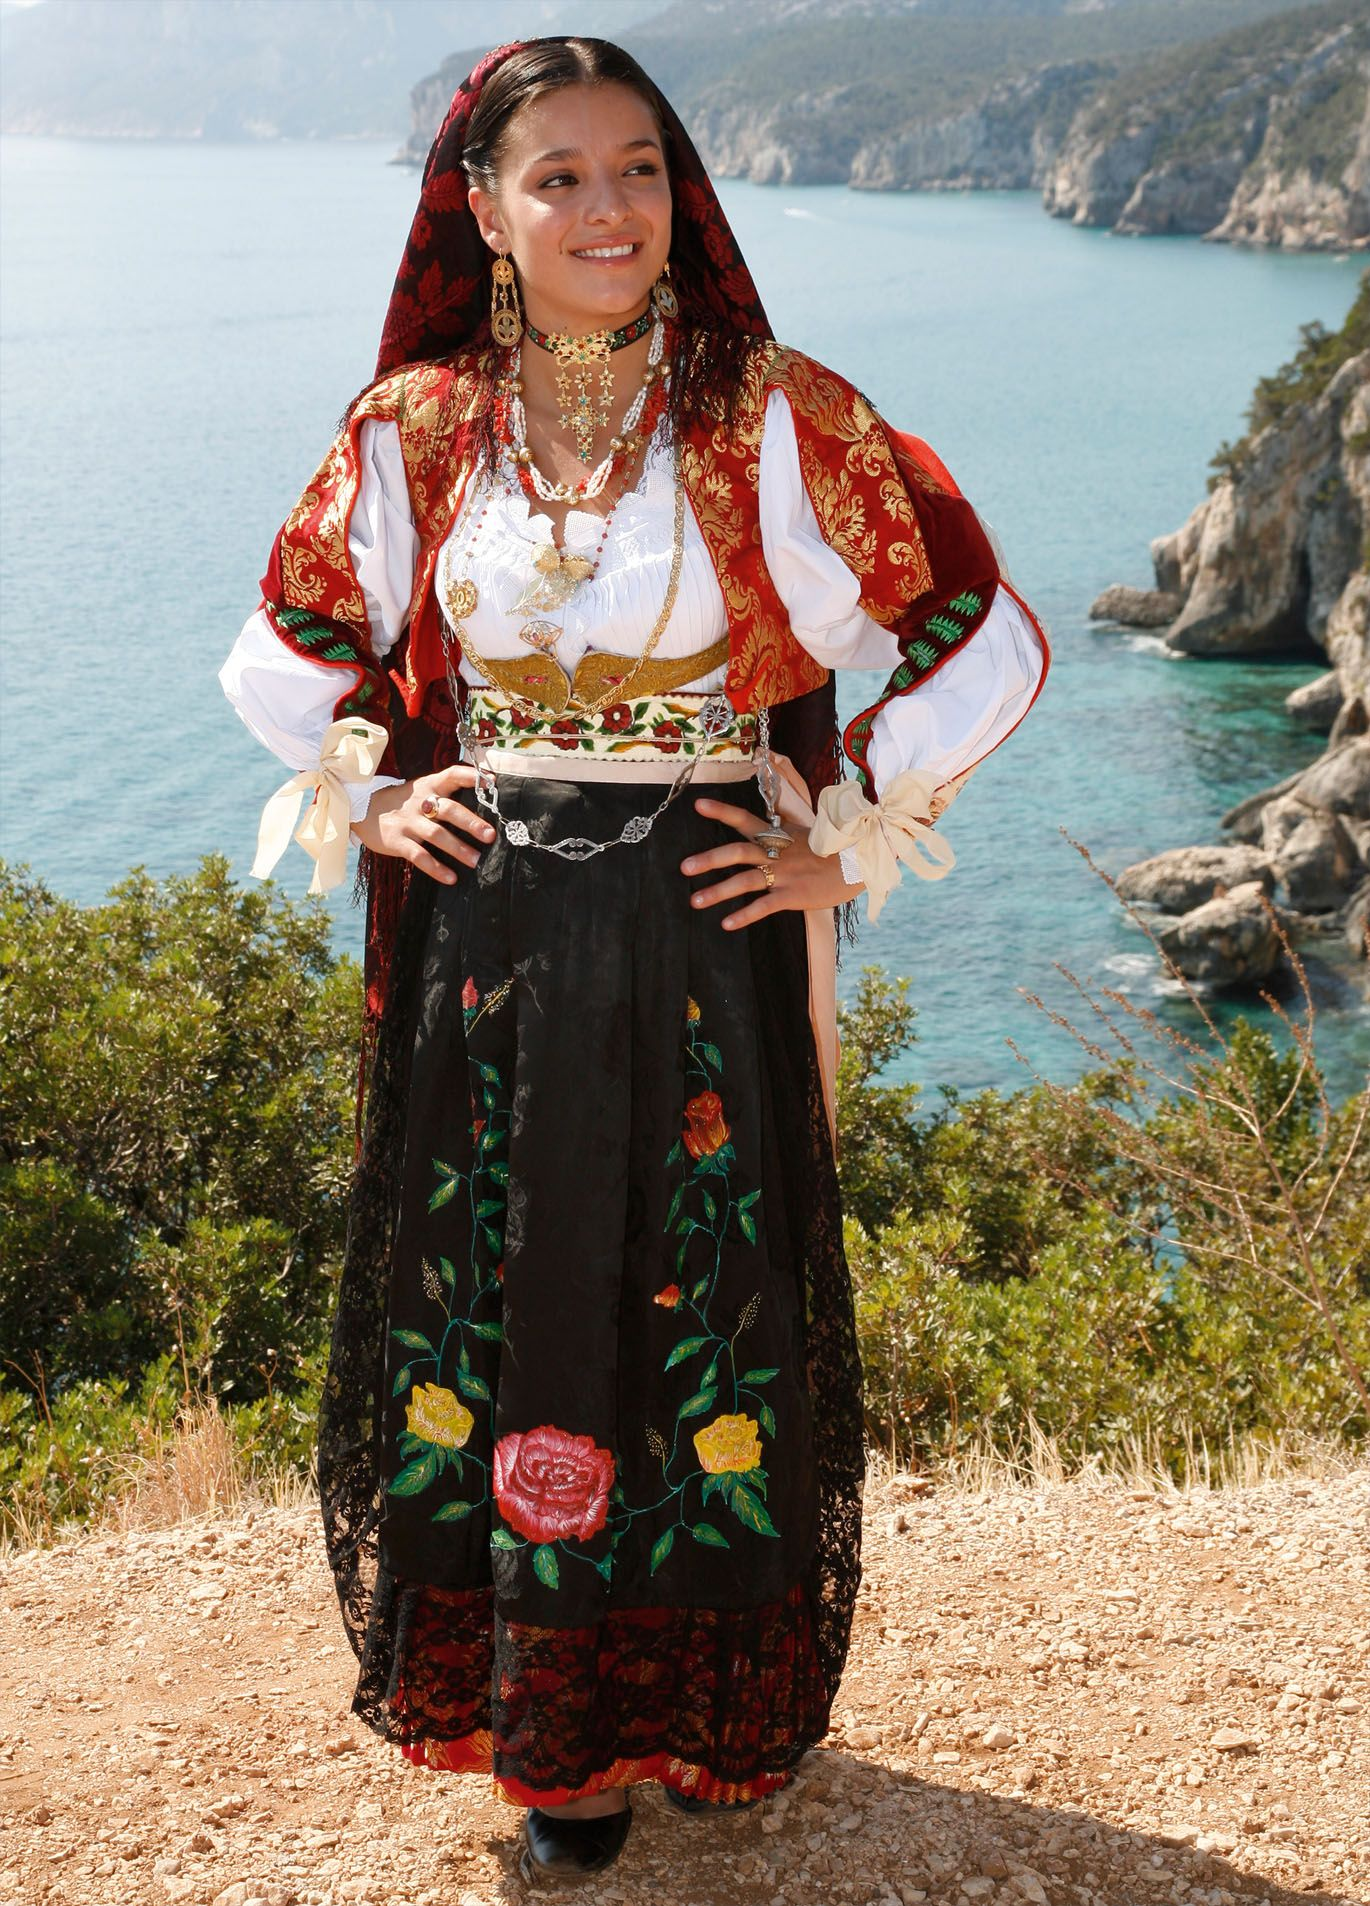 2019 year style- Italian traditional clothing style photo